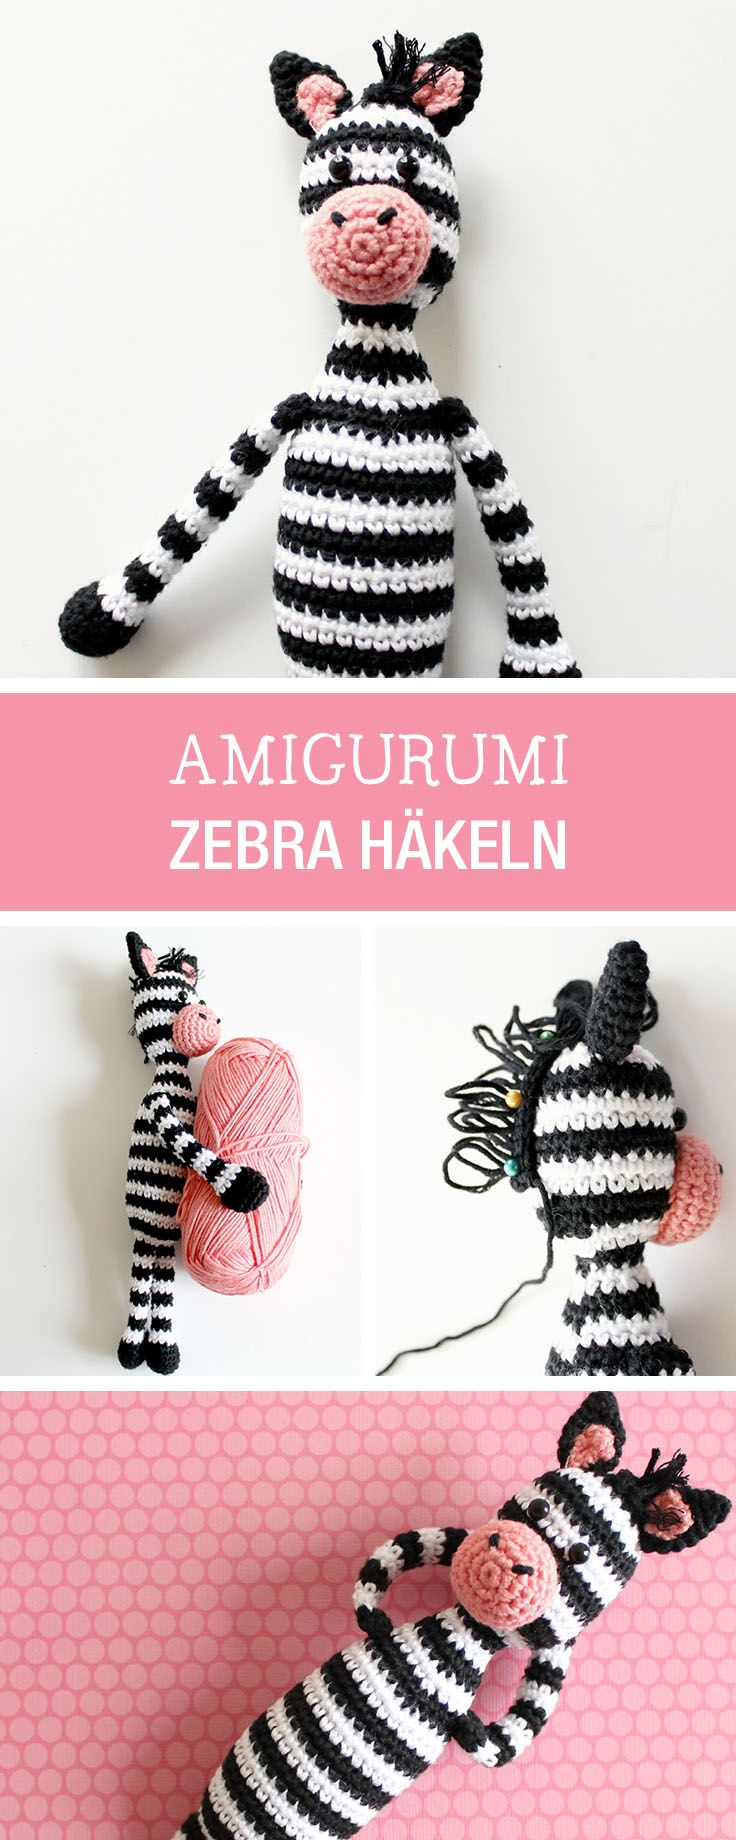 DIY-Anleitung: Ausbruch der Zootiere, Amigurumi Zebra selbst häkeln / DIY tutorial: escape of the zoo animals, crocheting amigurumi zebra via DaWanda.com